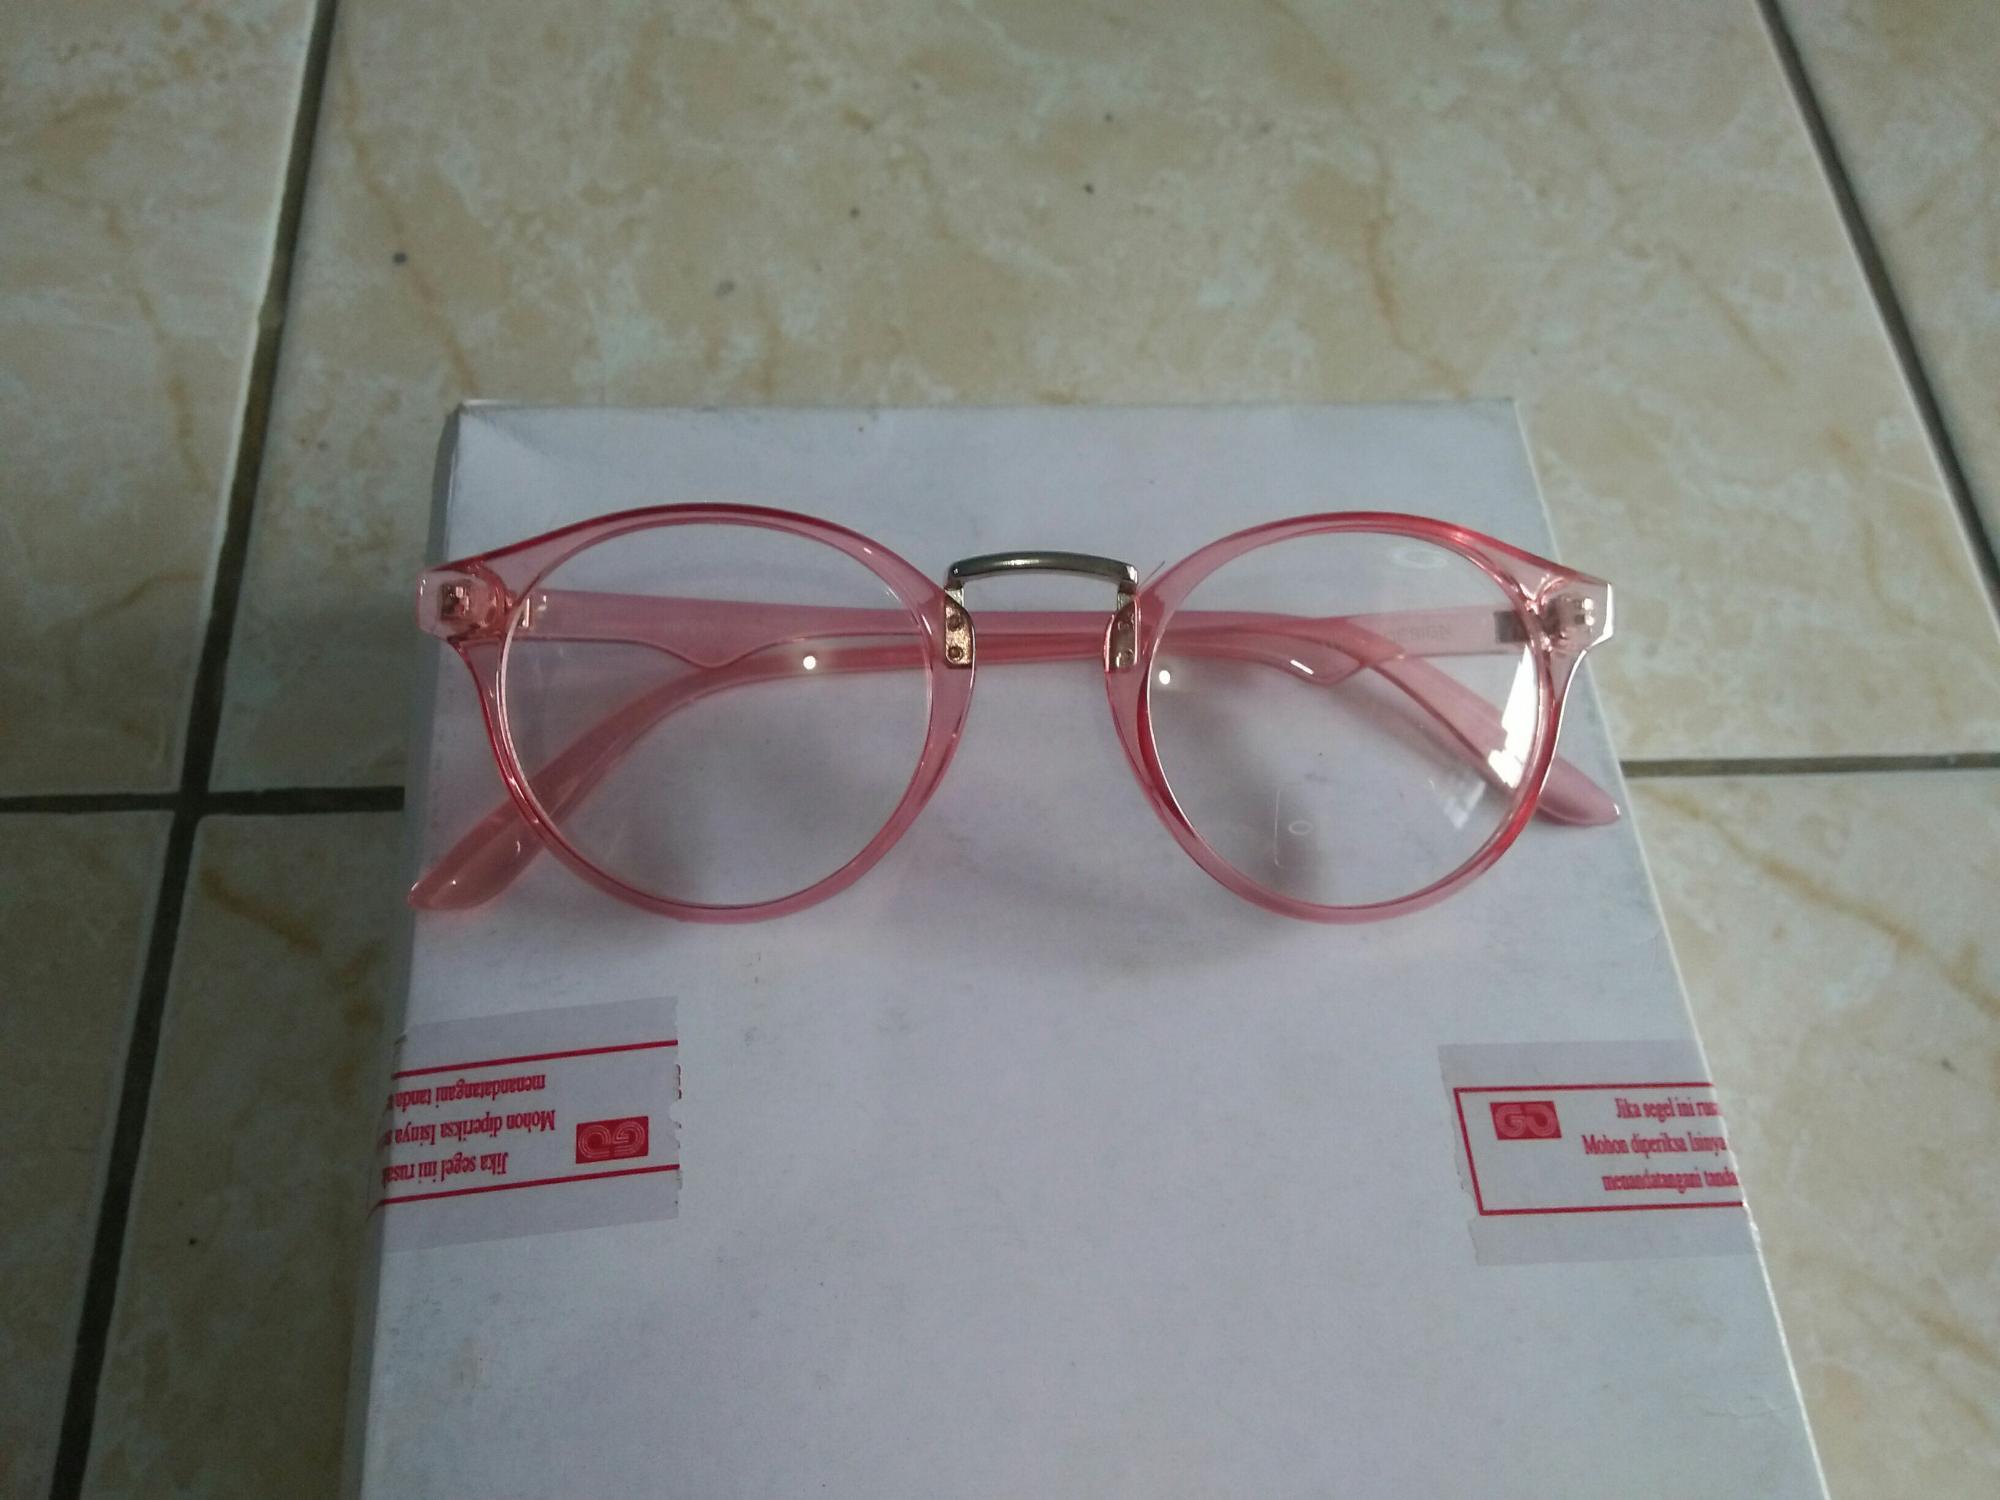 Promo Kacamata Fashion Bulat Oval Pink Gaya Trendy Ye903 - Daftar ... 73ff804f8a